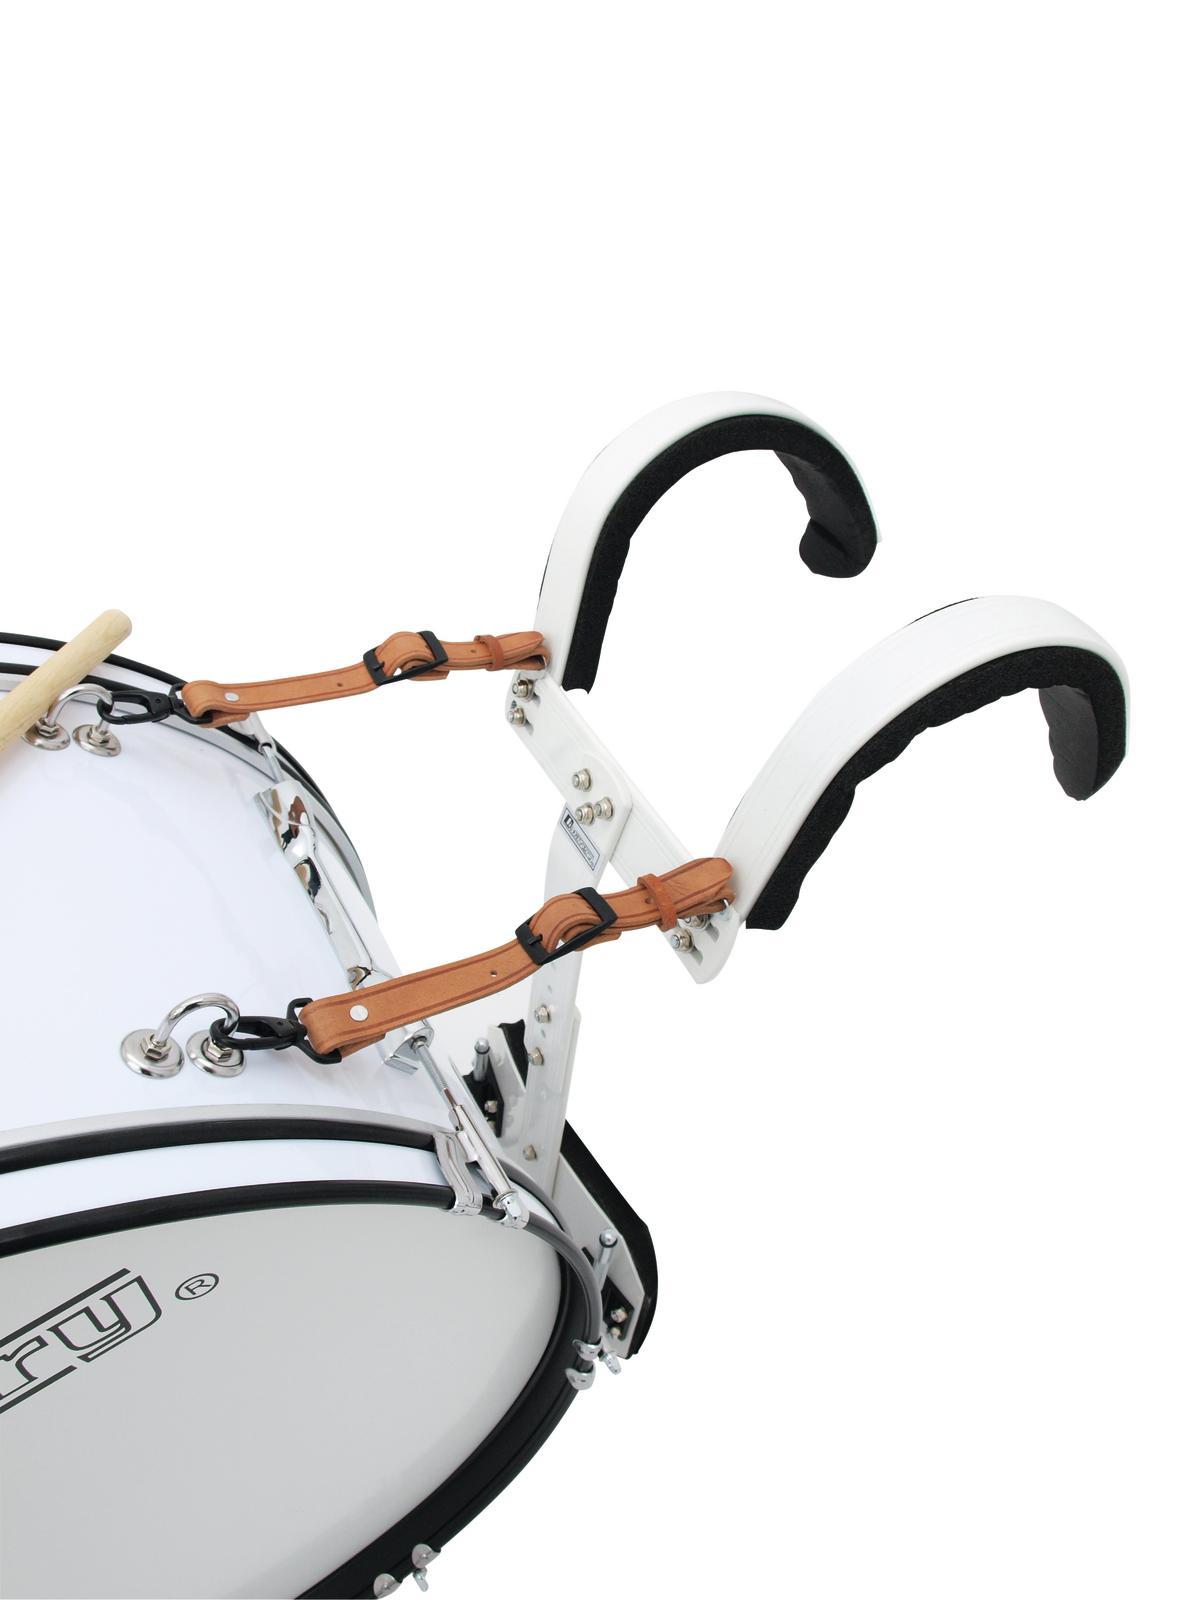 Drum-set da marcia per tamburo, bianco, 24x12 DIMAVERY MB-424